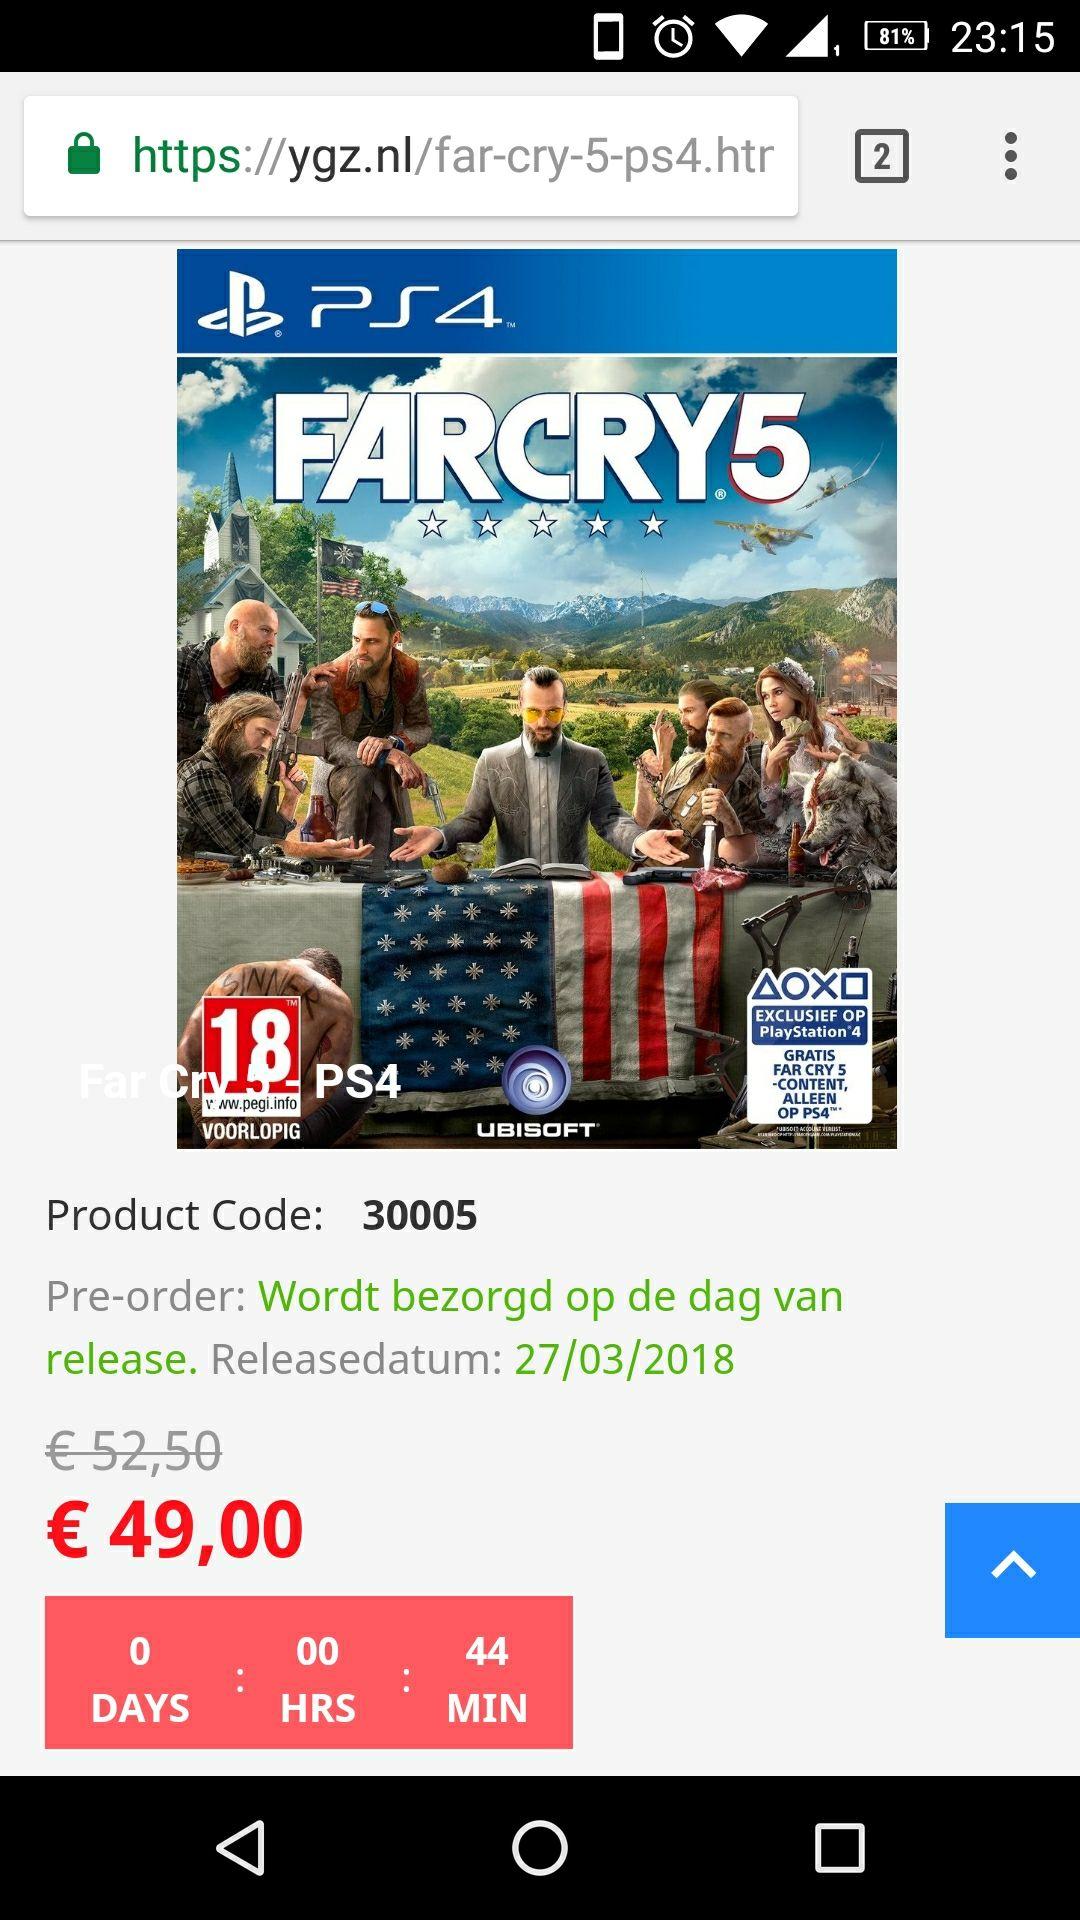 Far Cry 5 pre-order dagaanbieding NOG EEN PAAR MIN!